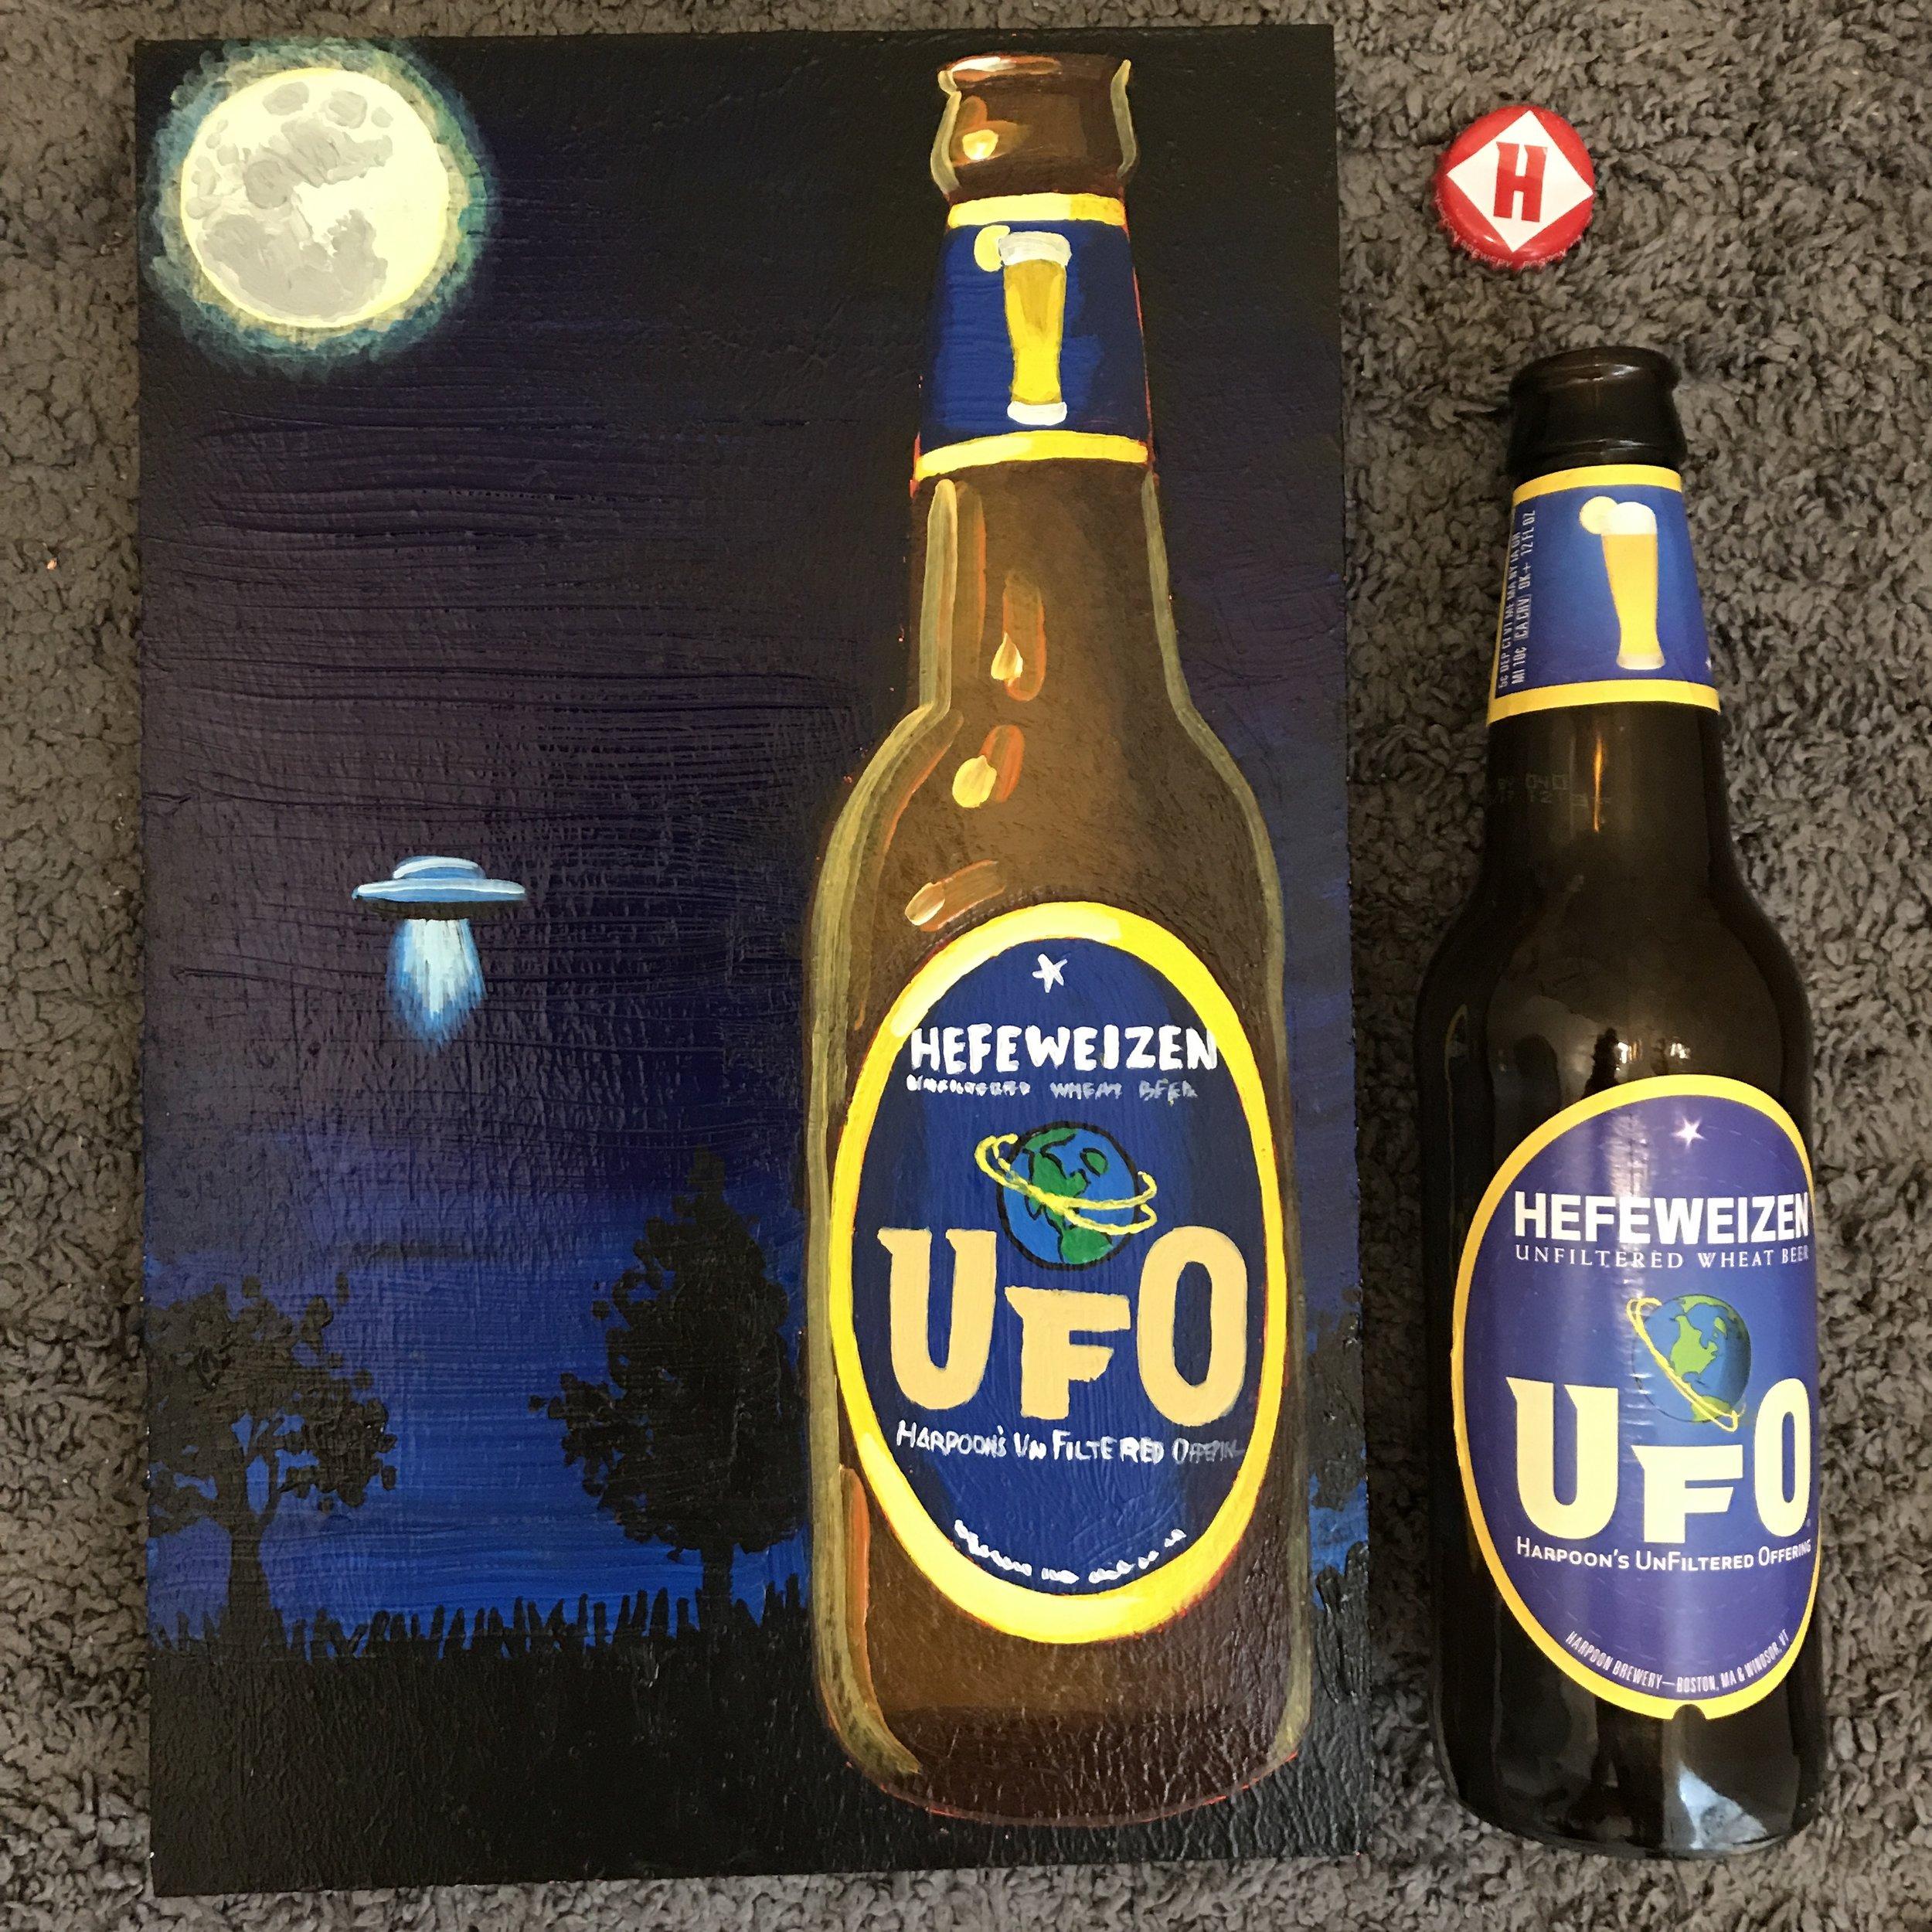 24 UFO Hefeweizen (USA)